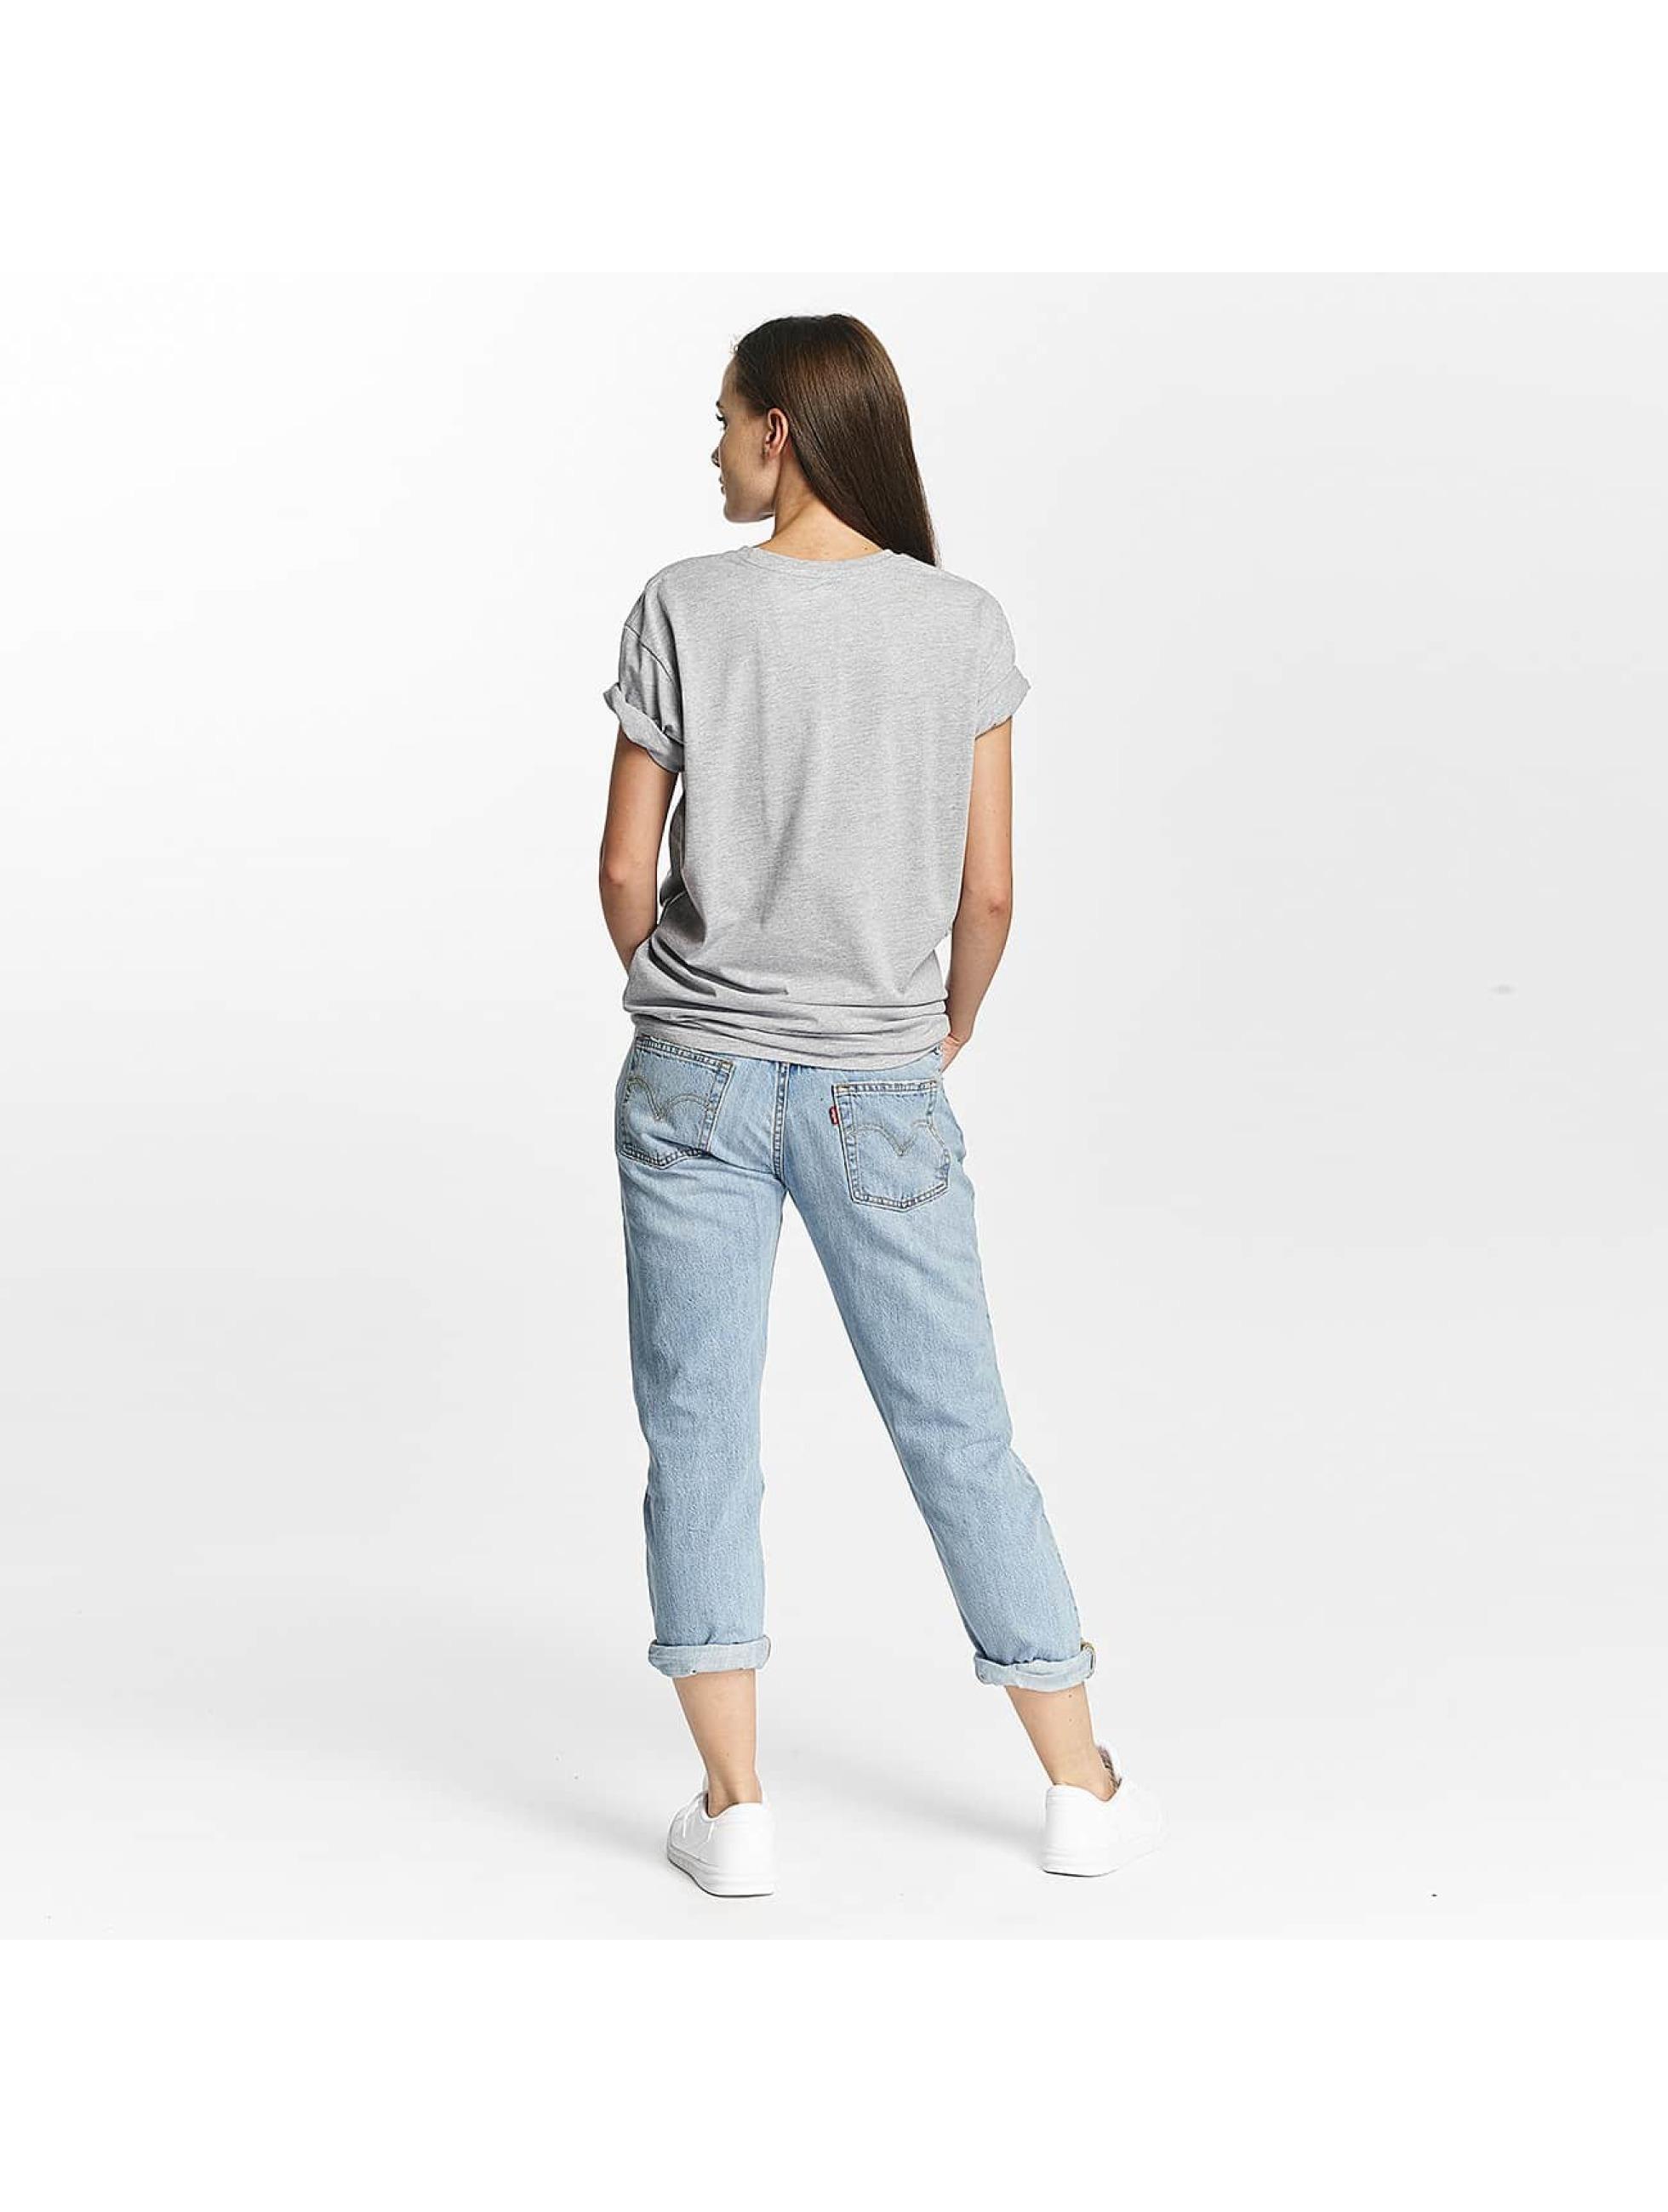 Cyprime Camiseta Holmium Oversized gris